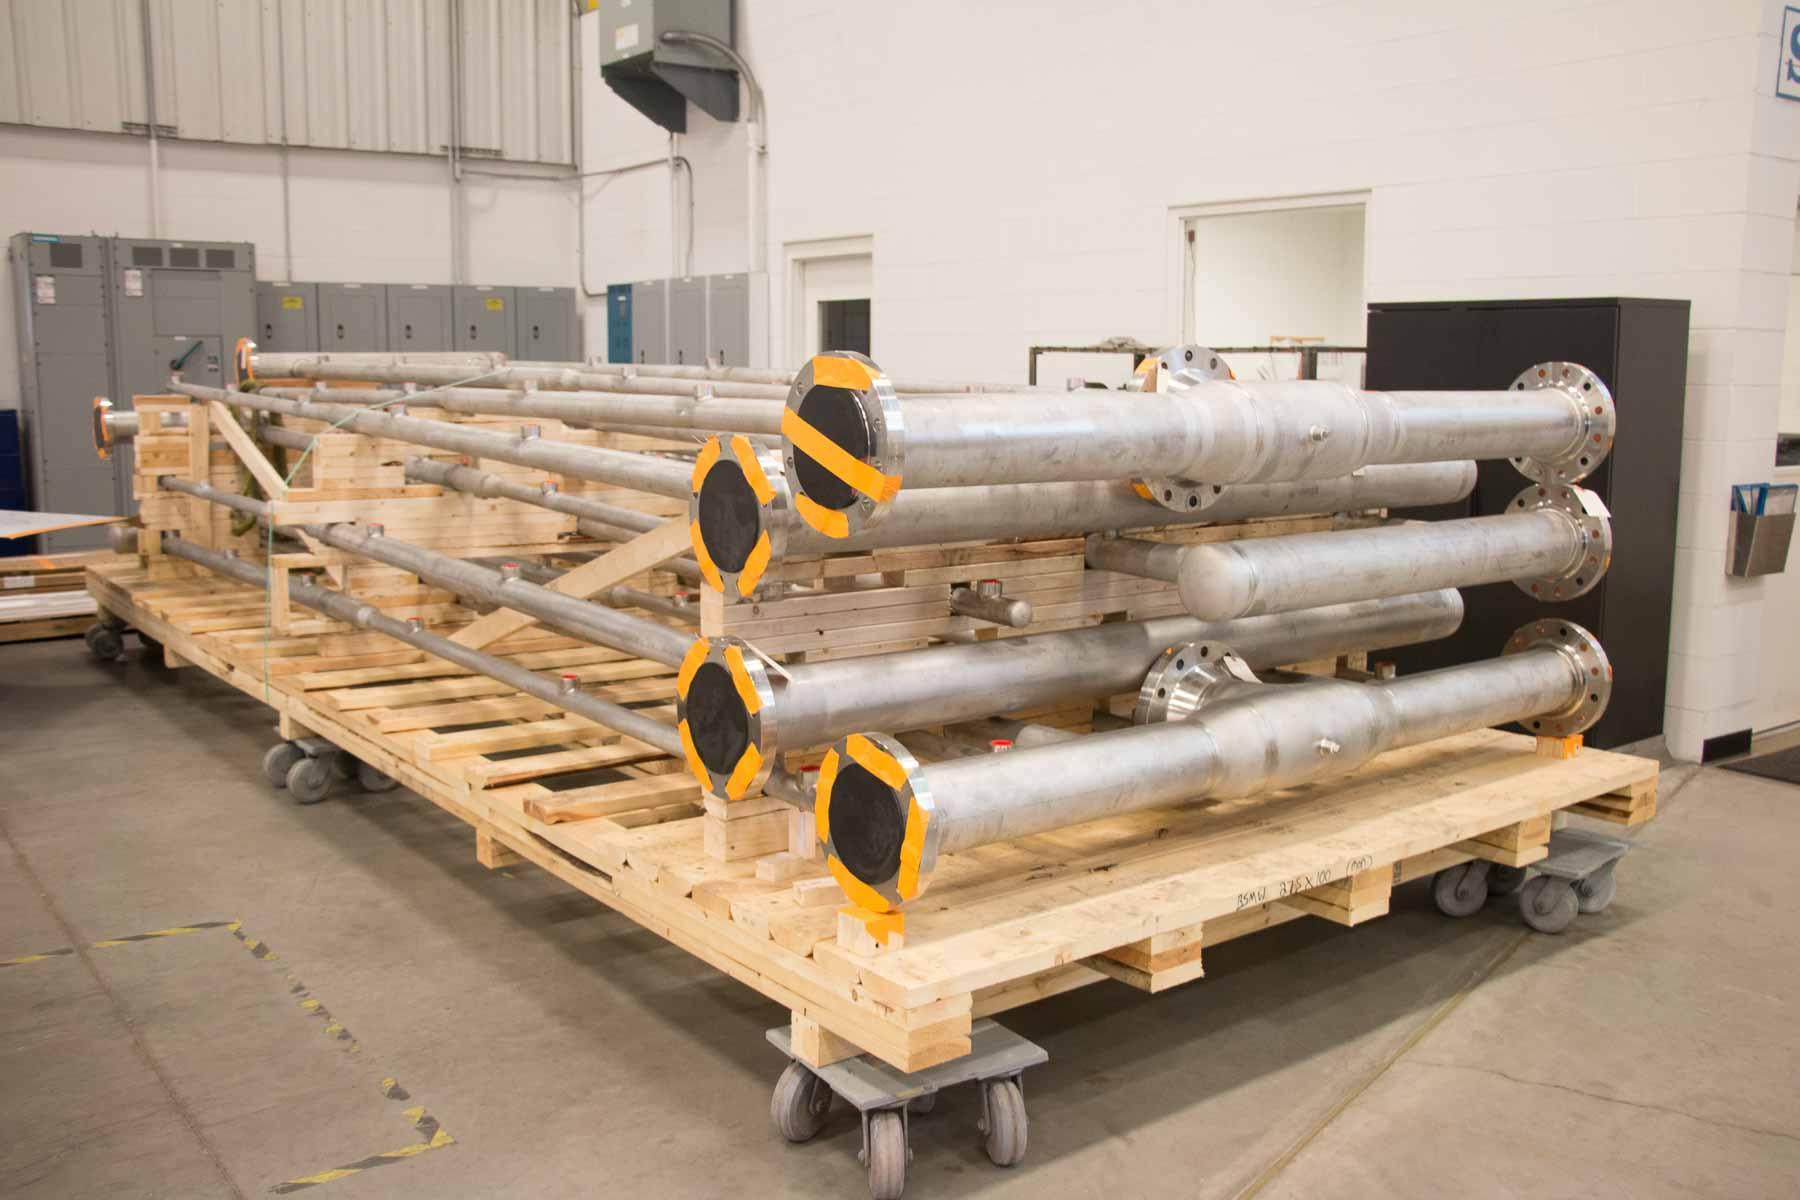 Badger process piping fabrication